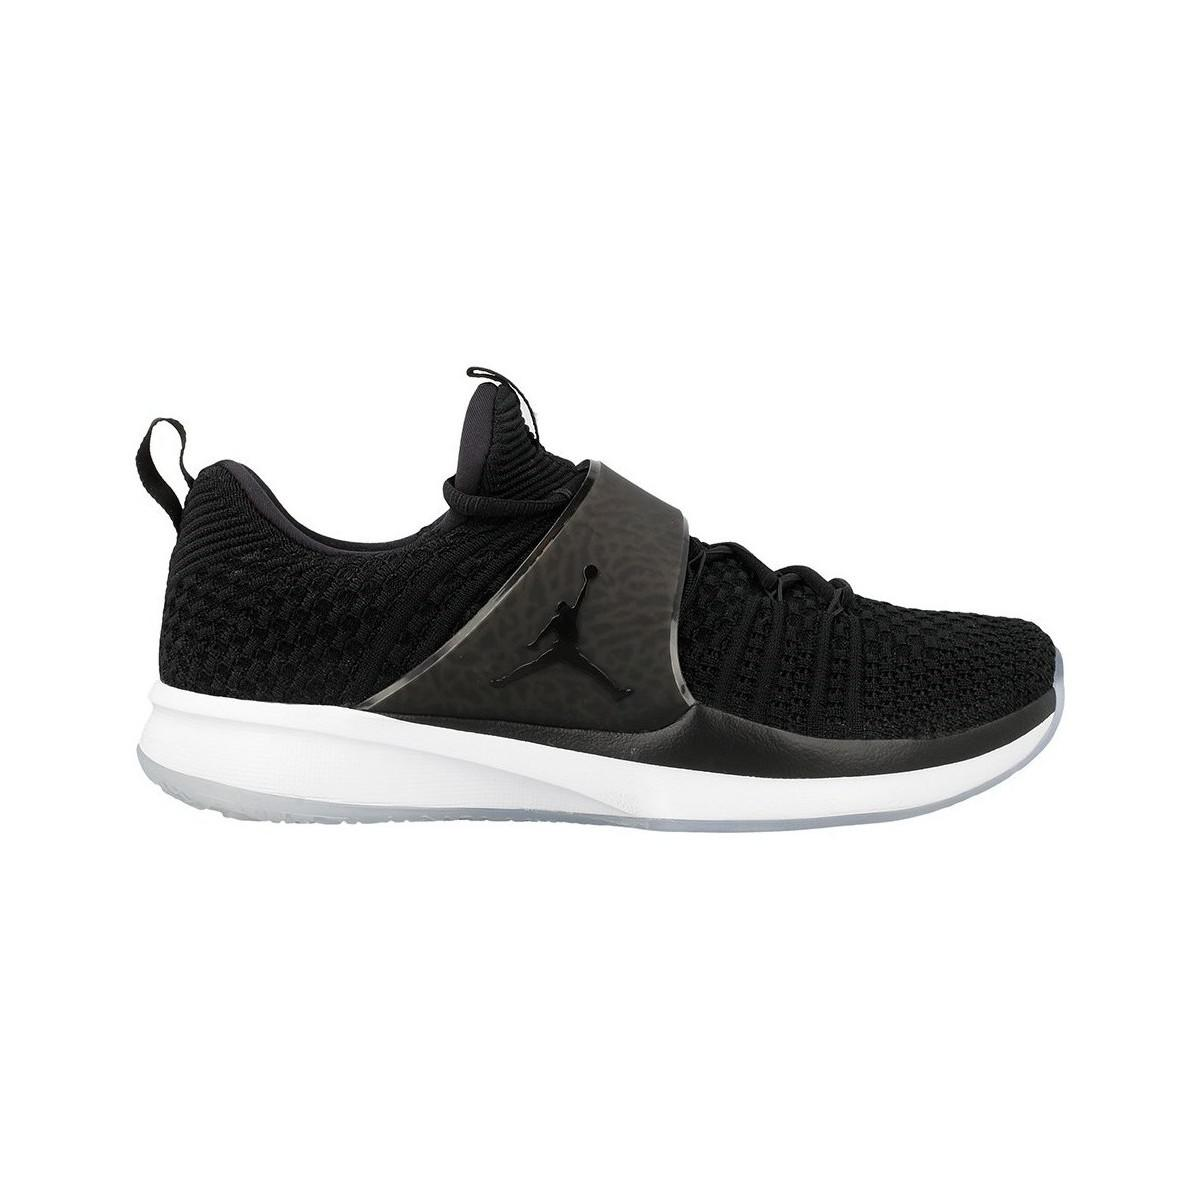 Nike - Jordan Trainer 2 Flyknit Men s Shoes (trainers) In White for Men -.  View fullscreen 086f8fc3c